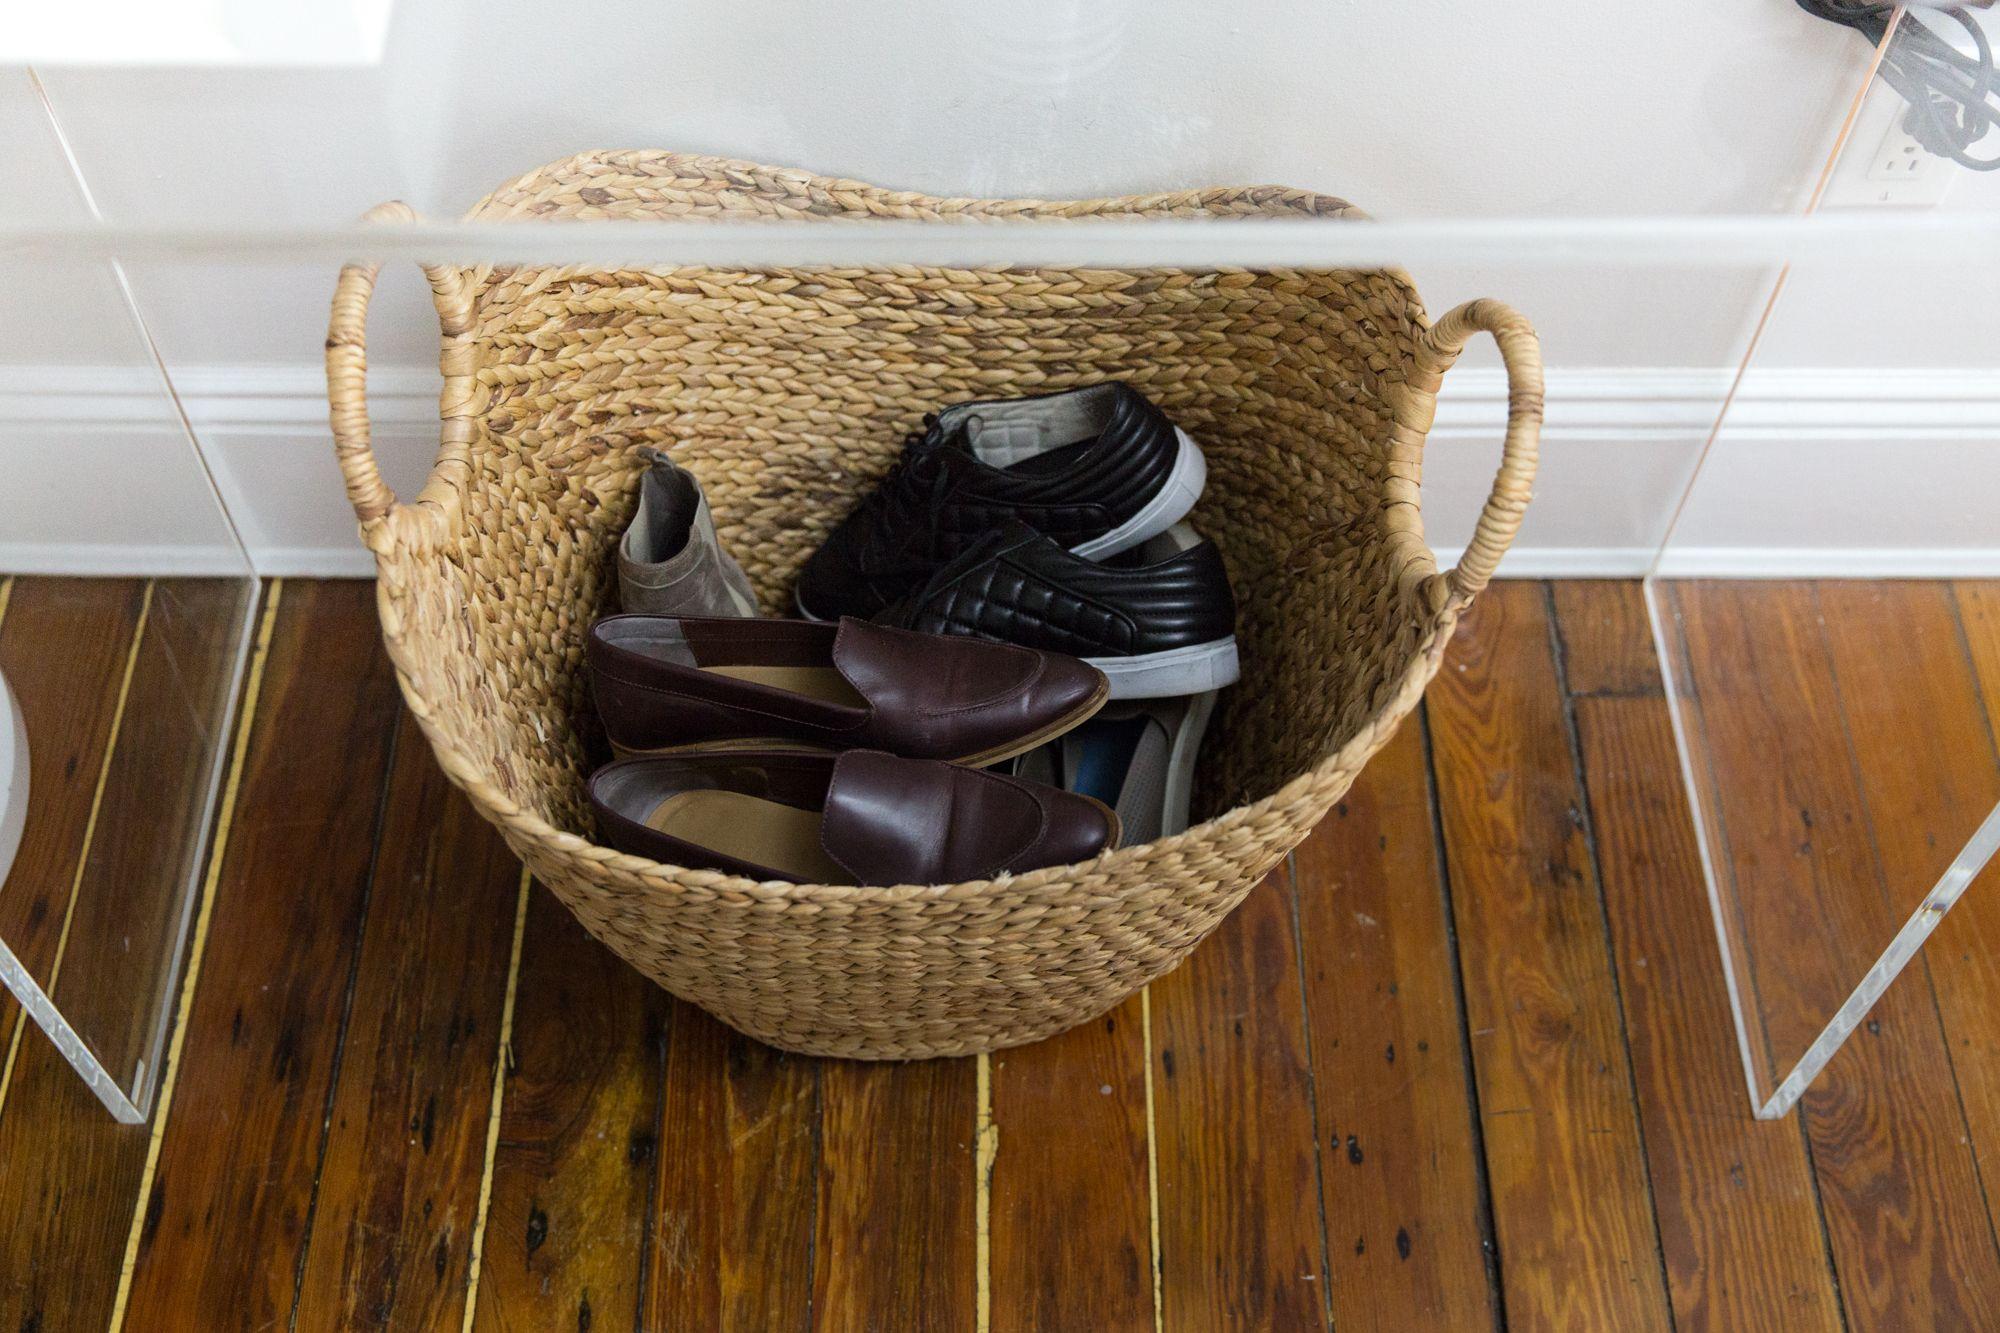 Genius shoe storage under the table.